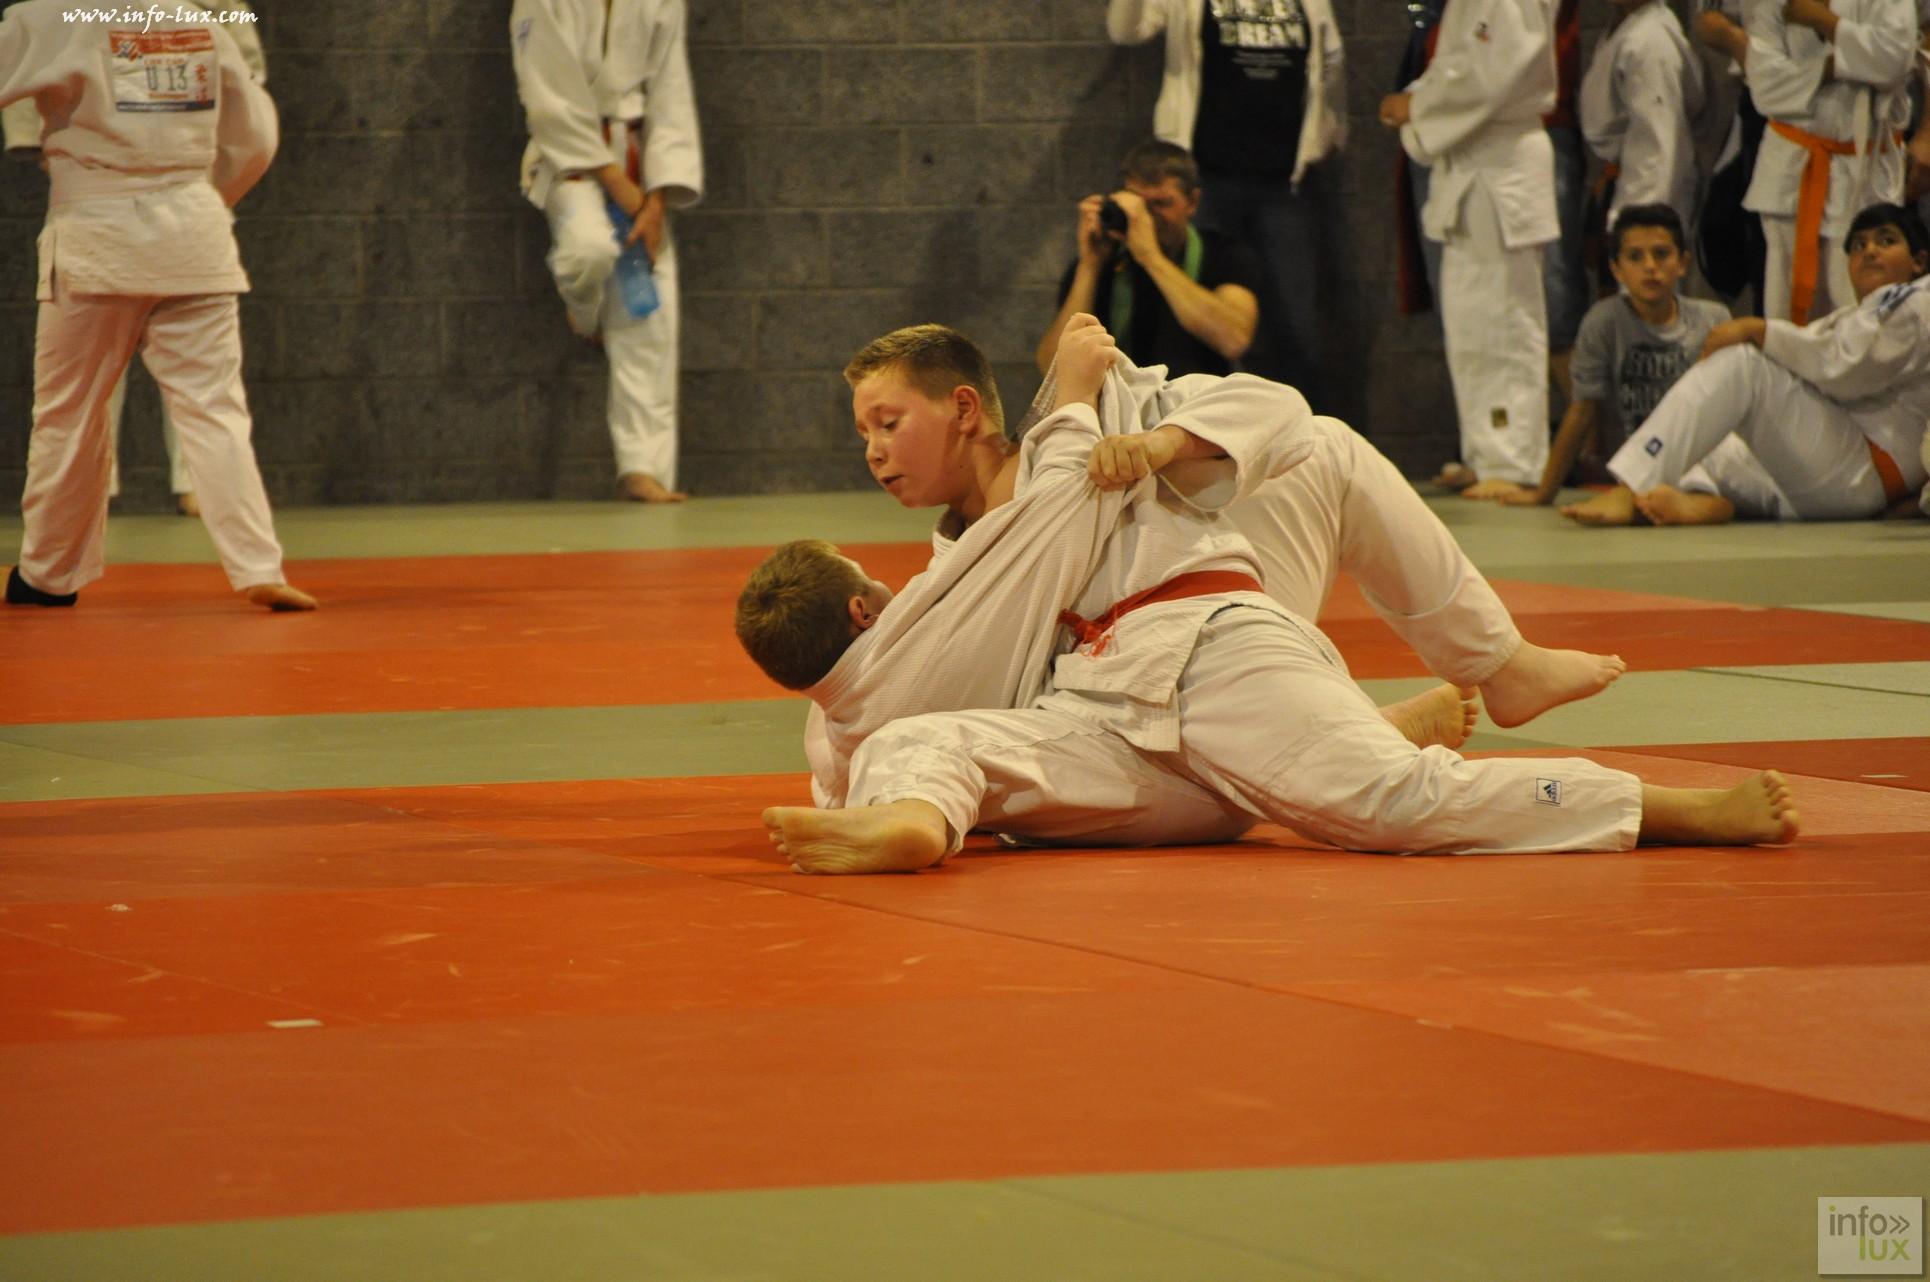 images/stories/PHOTOSREP/Bastogne/judo/Judo-Basto72